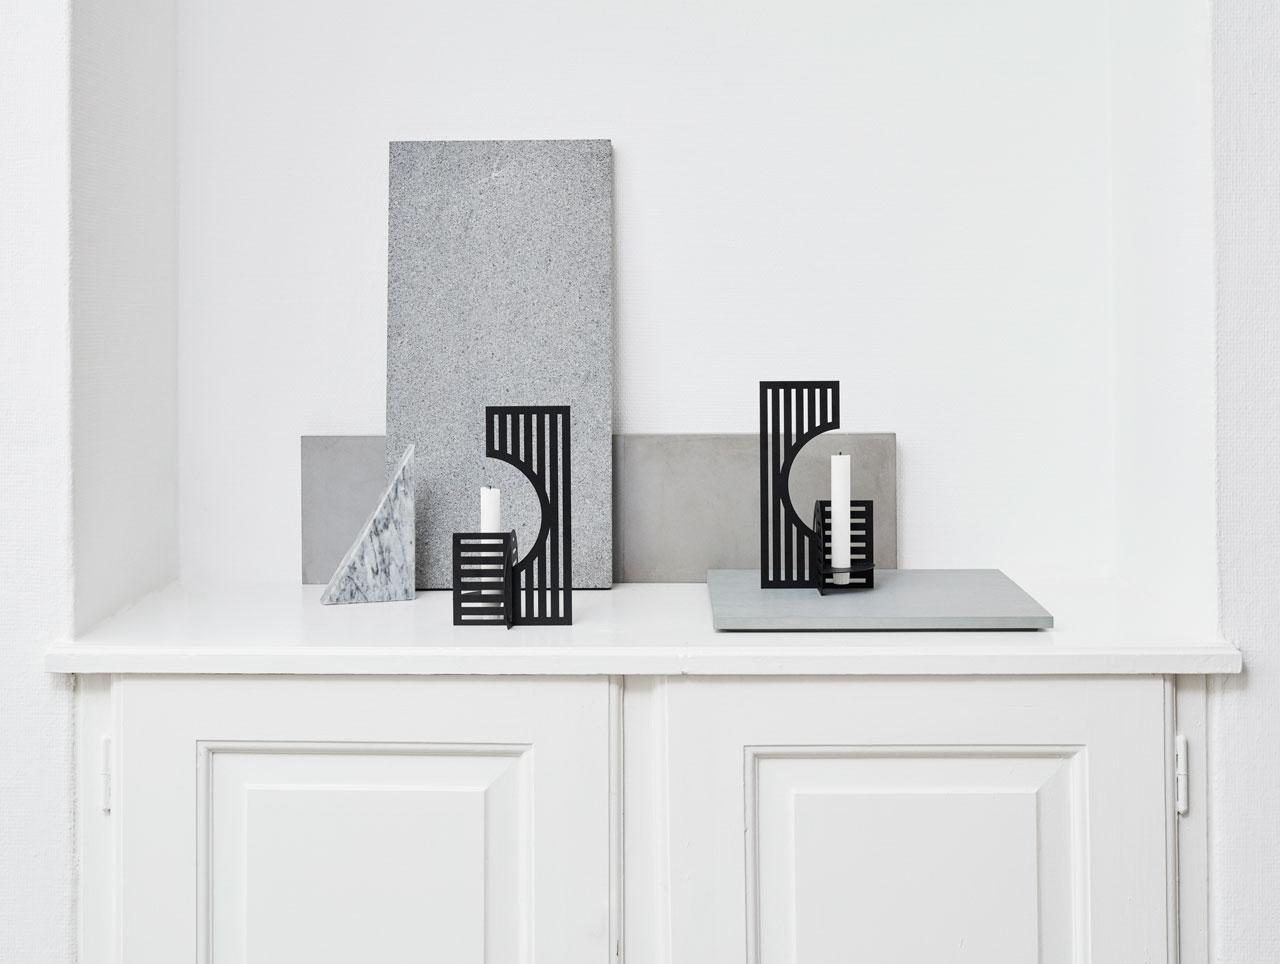 Bauhaus-inspiredDash Candlestick byKristina Dam Studio.